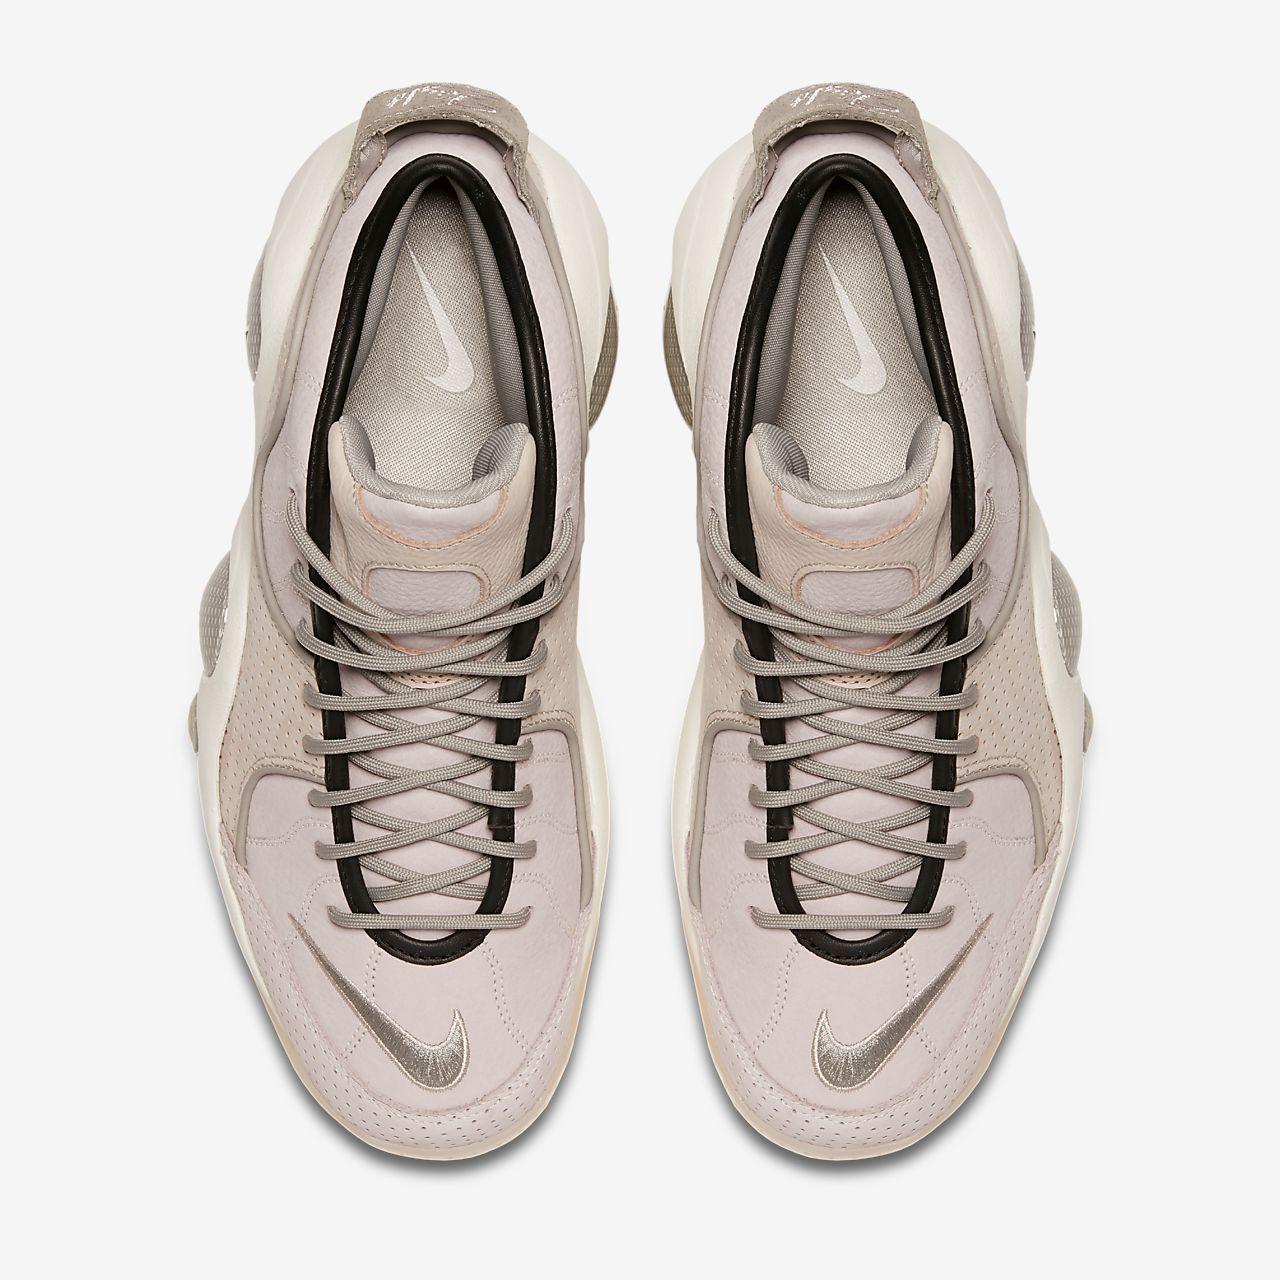 0fea0554642a02 Nike Air Zoom Flight 95 Men s Shoe. Nike.com GB